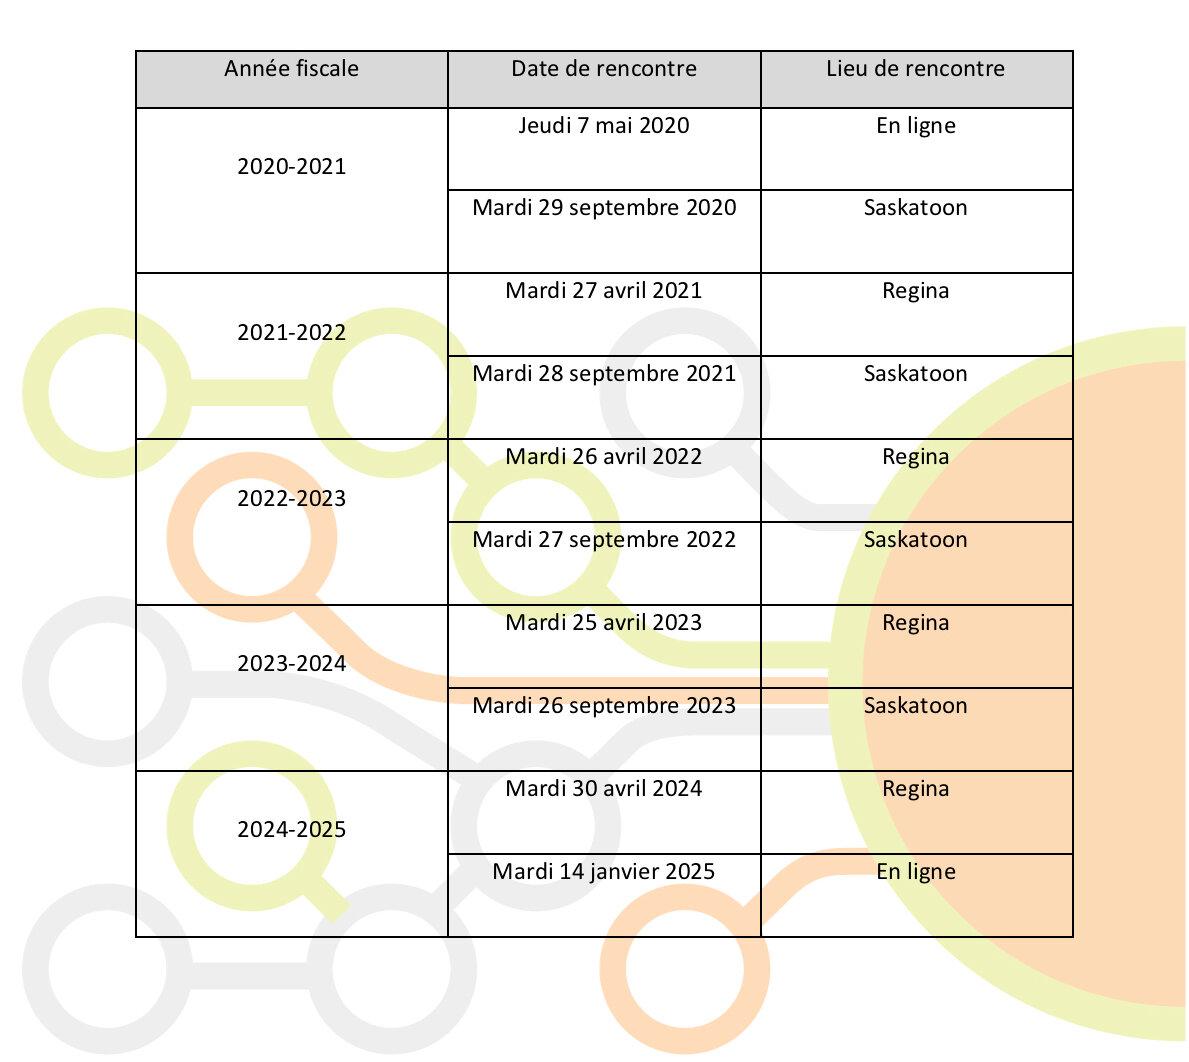 Calendrier des rencontres 2020-2025